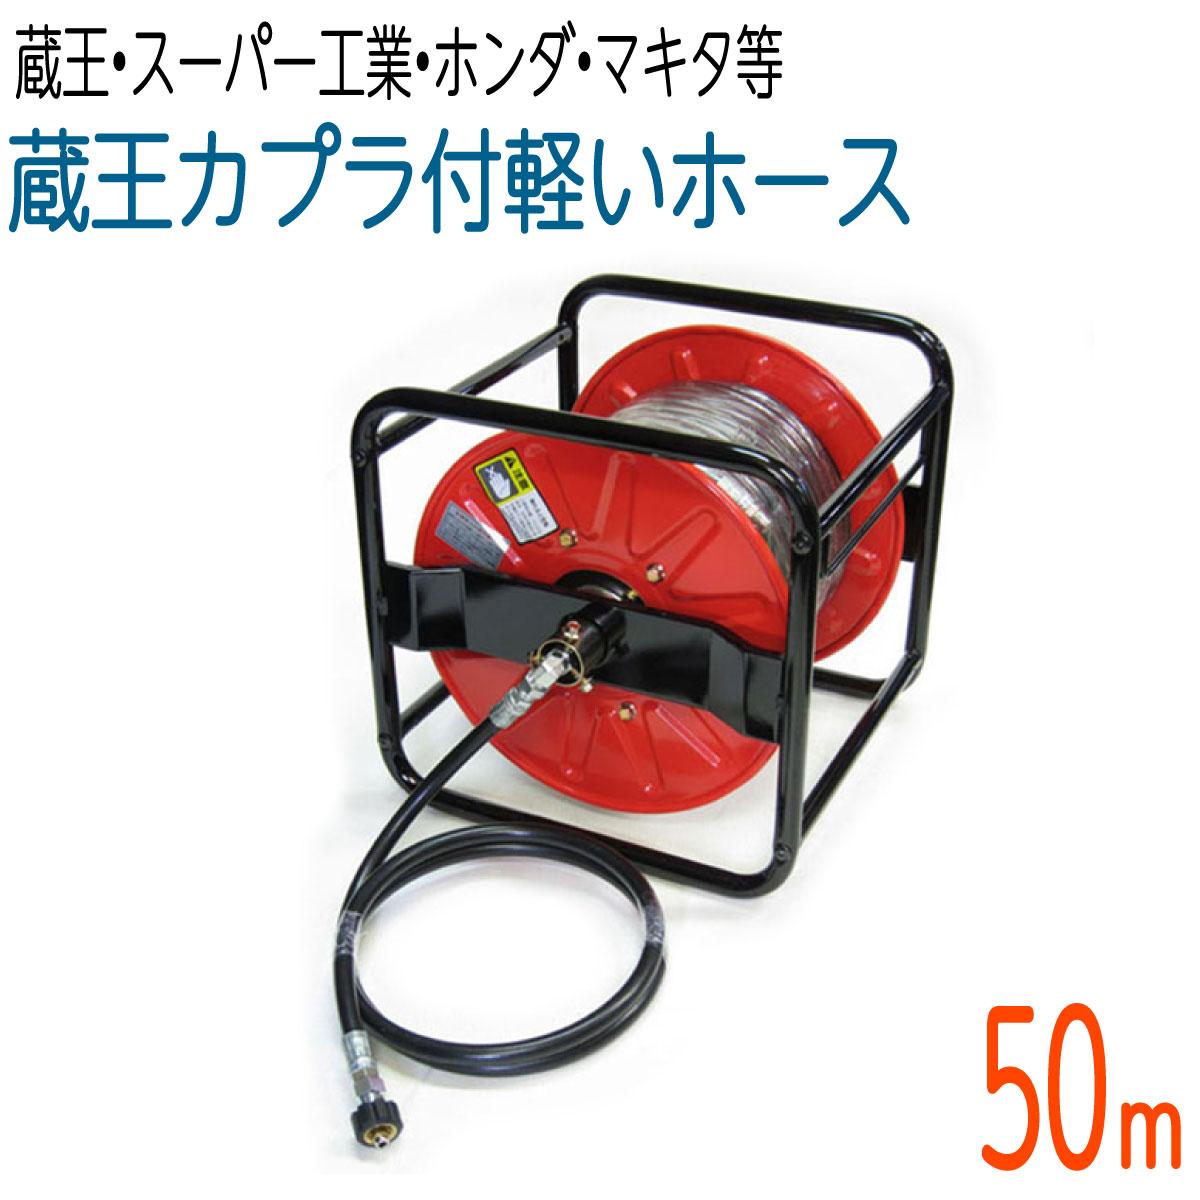 【50M】軽いホース蔵王産業(エンジン式)・スーパー工業対応カプラ付き